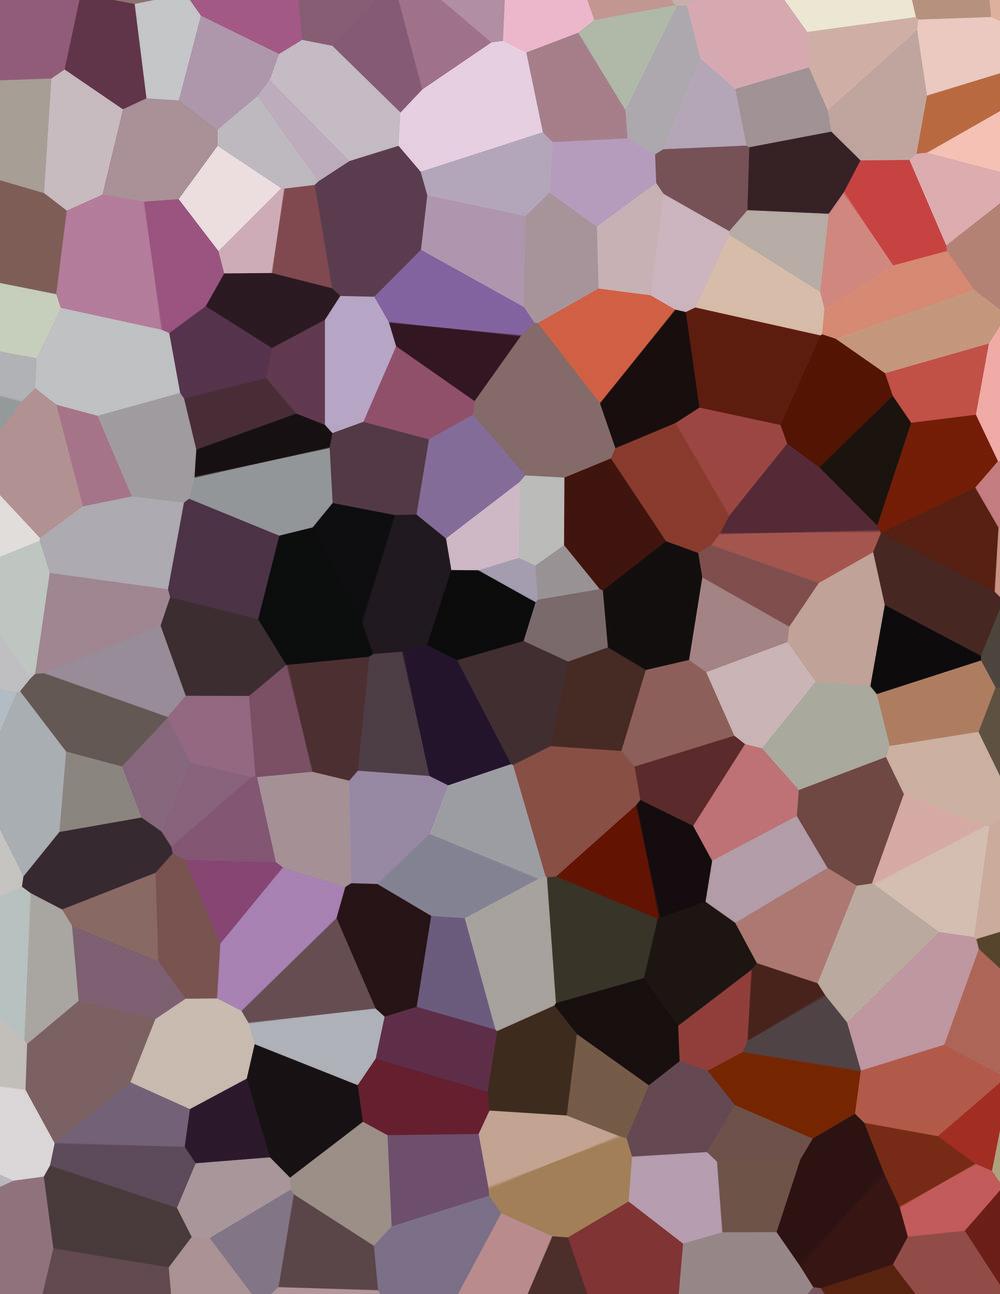 rock_5_mosaic.jpg